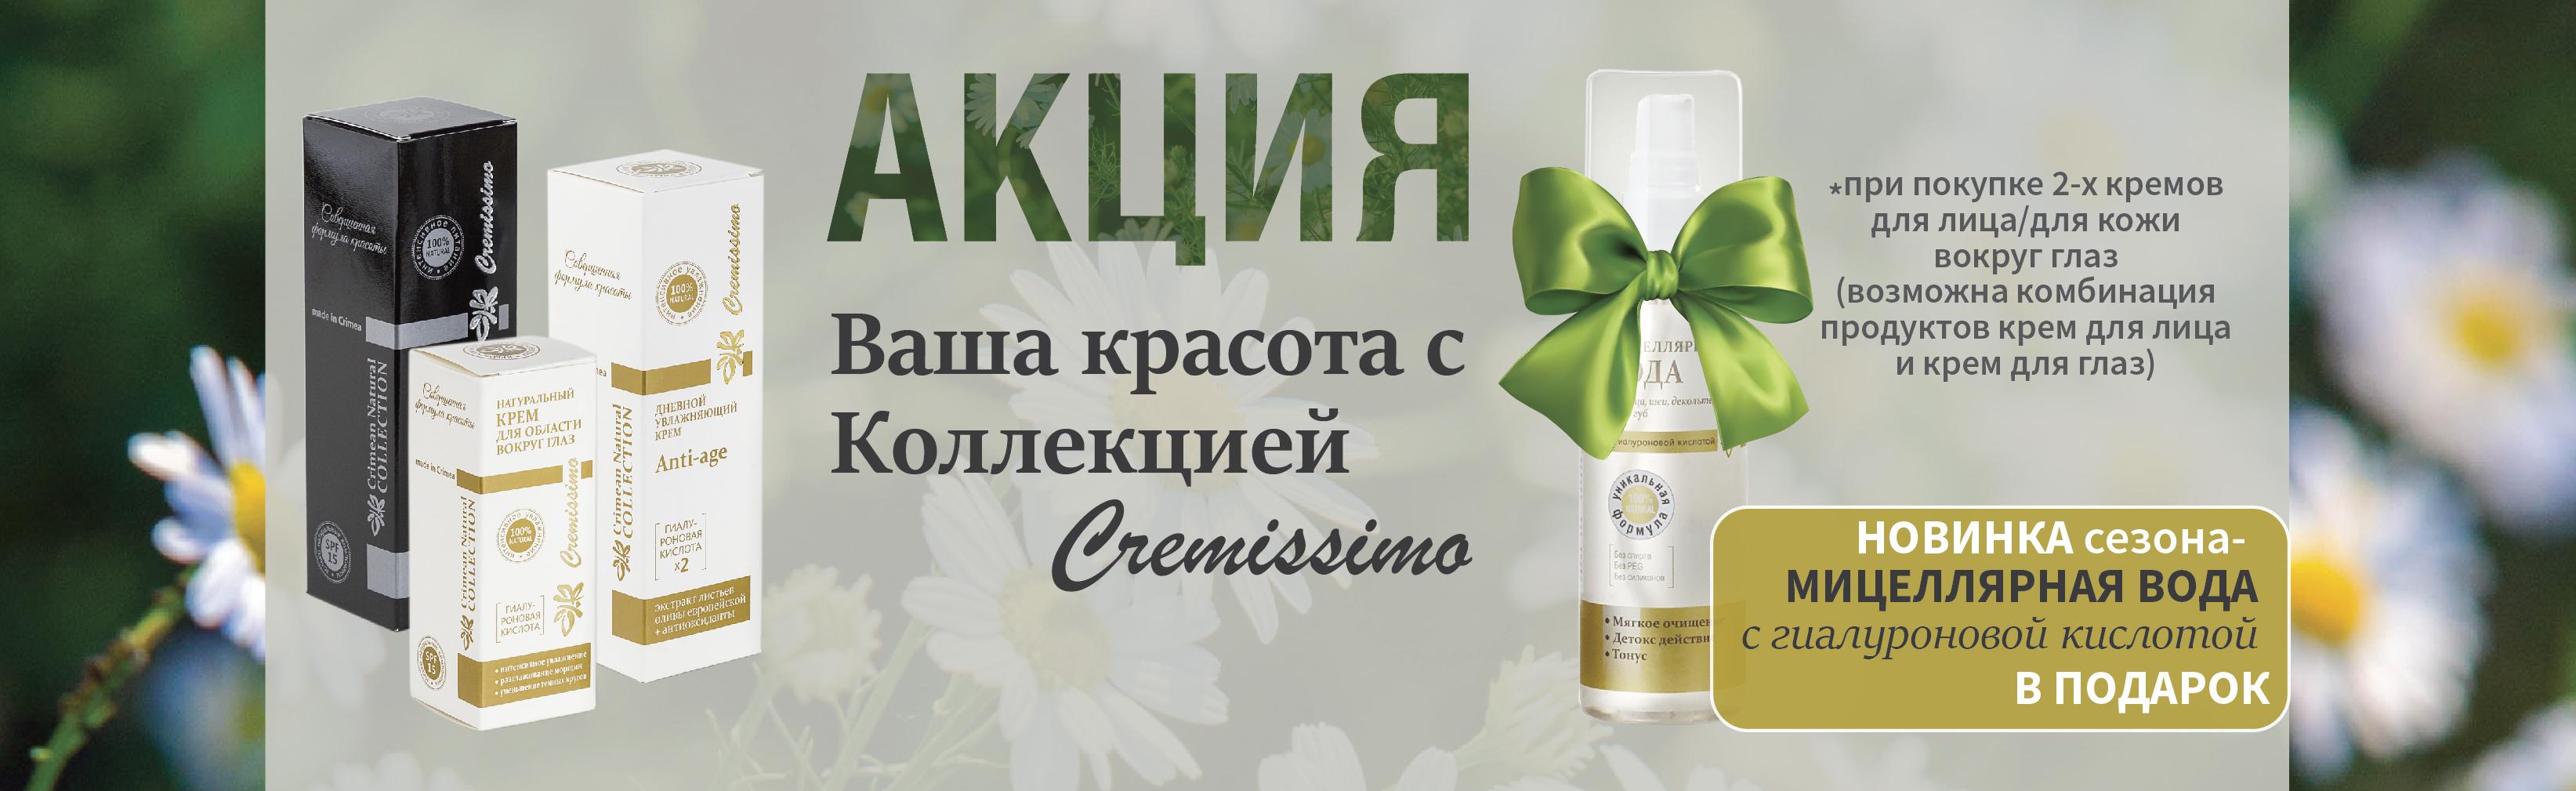 banner-web-akciya-2x1-1140350